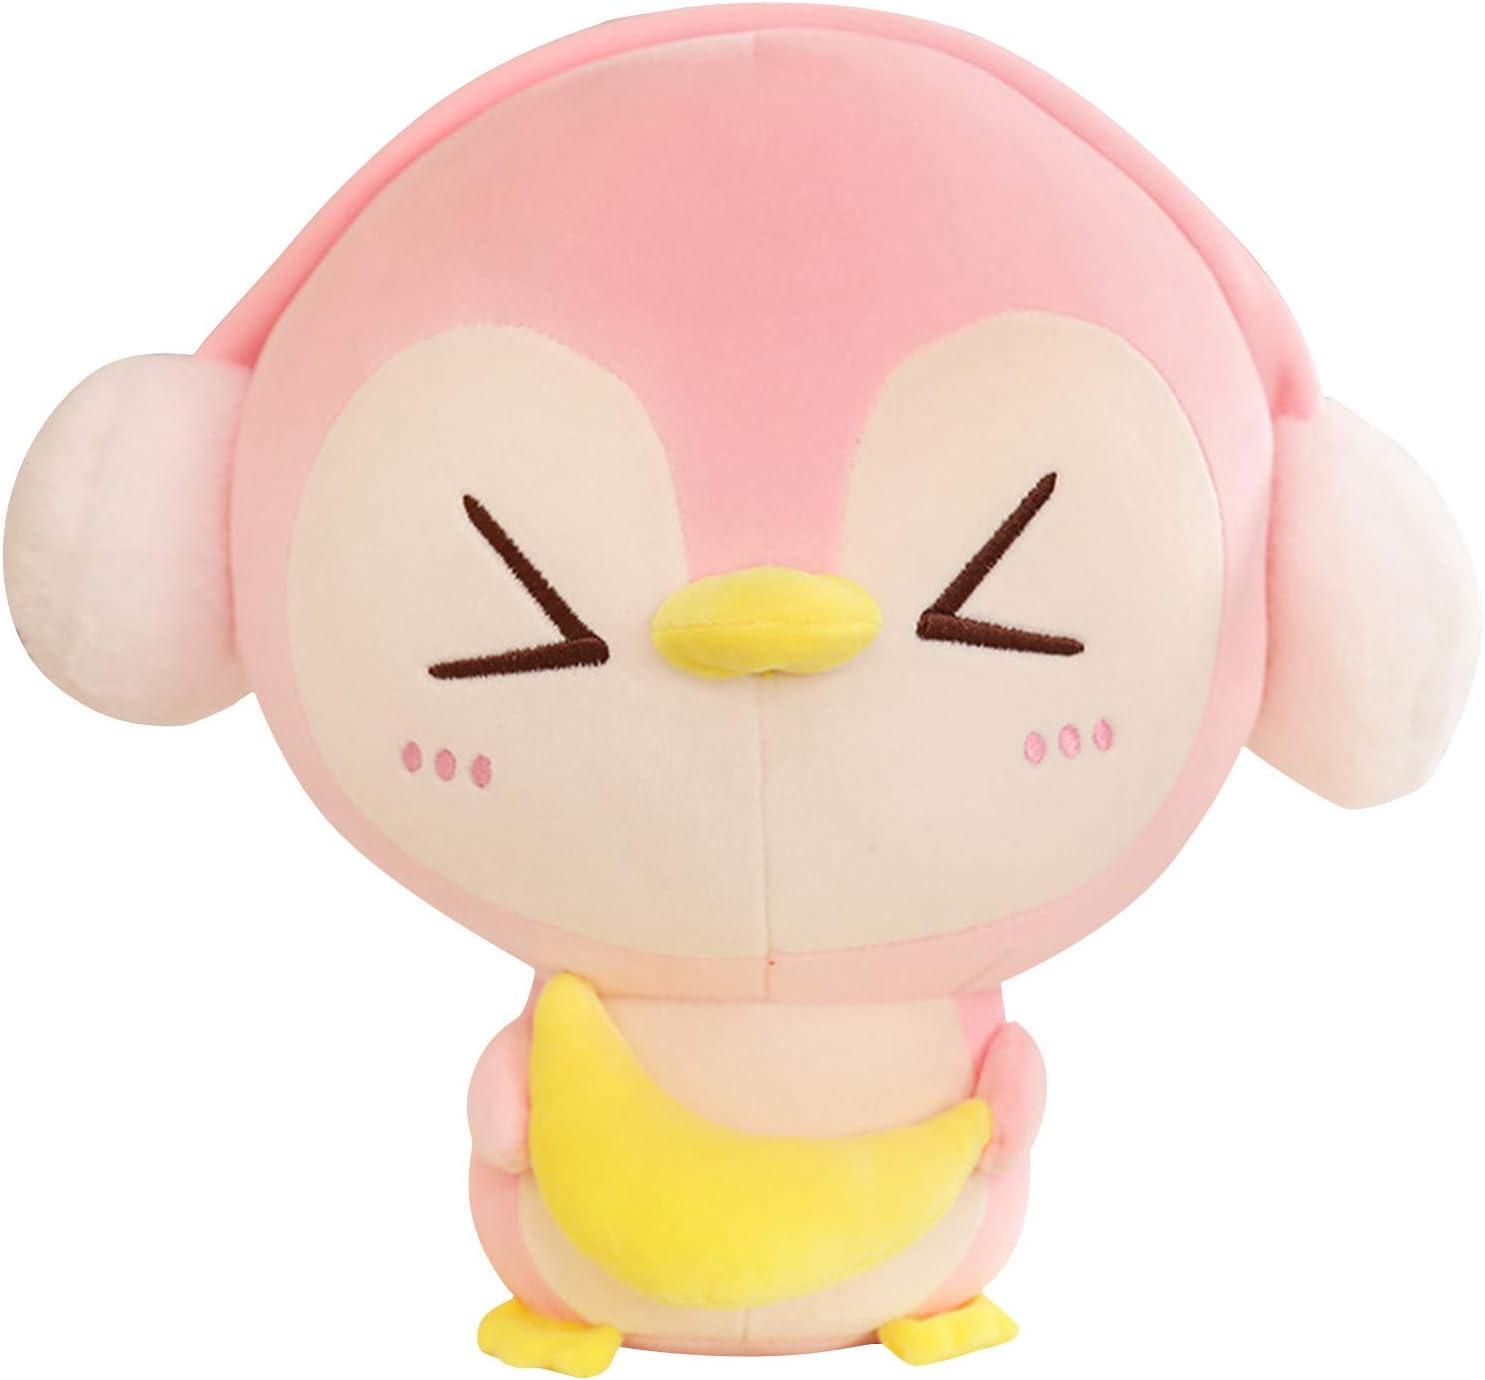 New arrival RYGHEWE Plush 2021 model Pillow Toy Stuffed Animal Cute Simulation Penguin